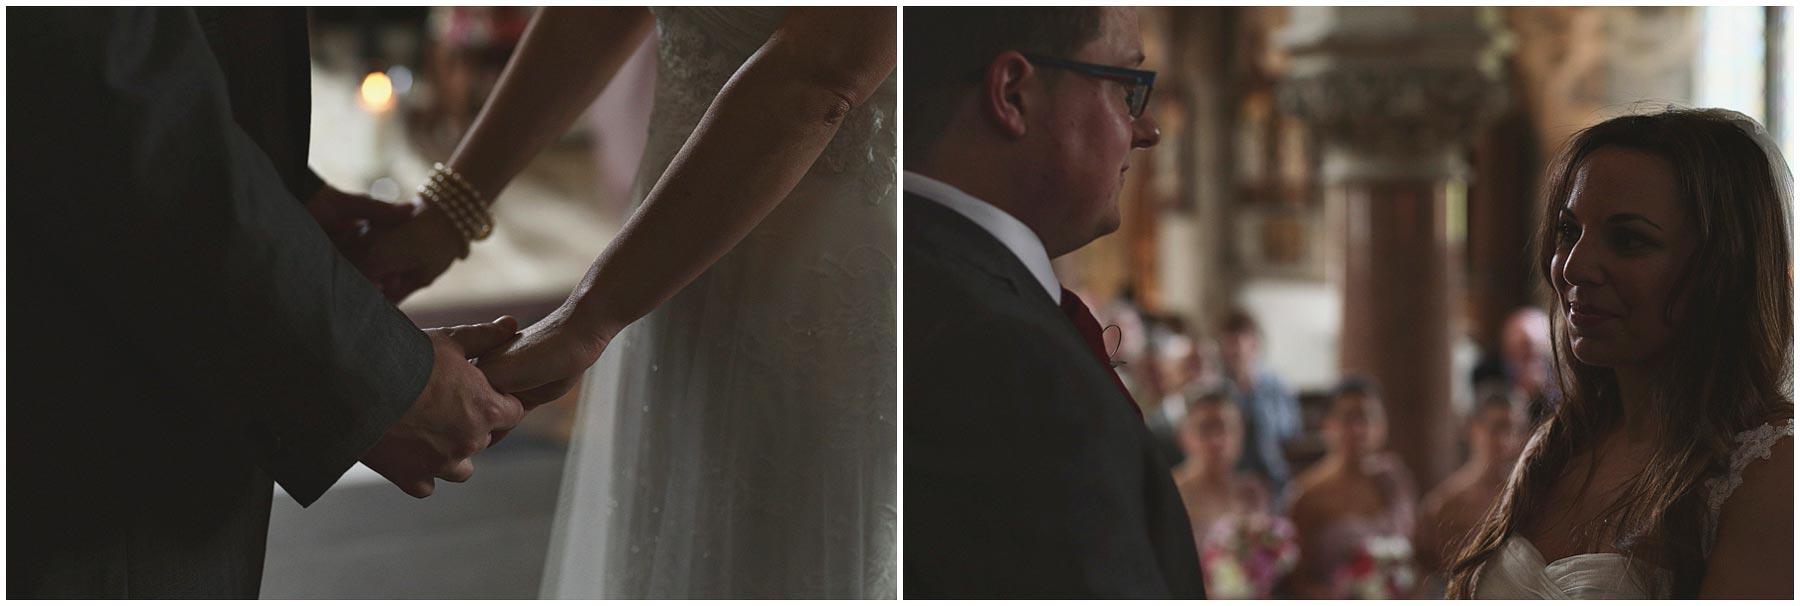 Rudding-Park-Wedding-Photography_0053